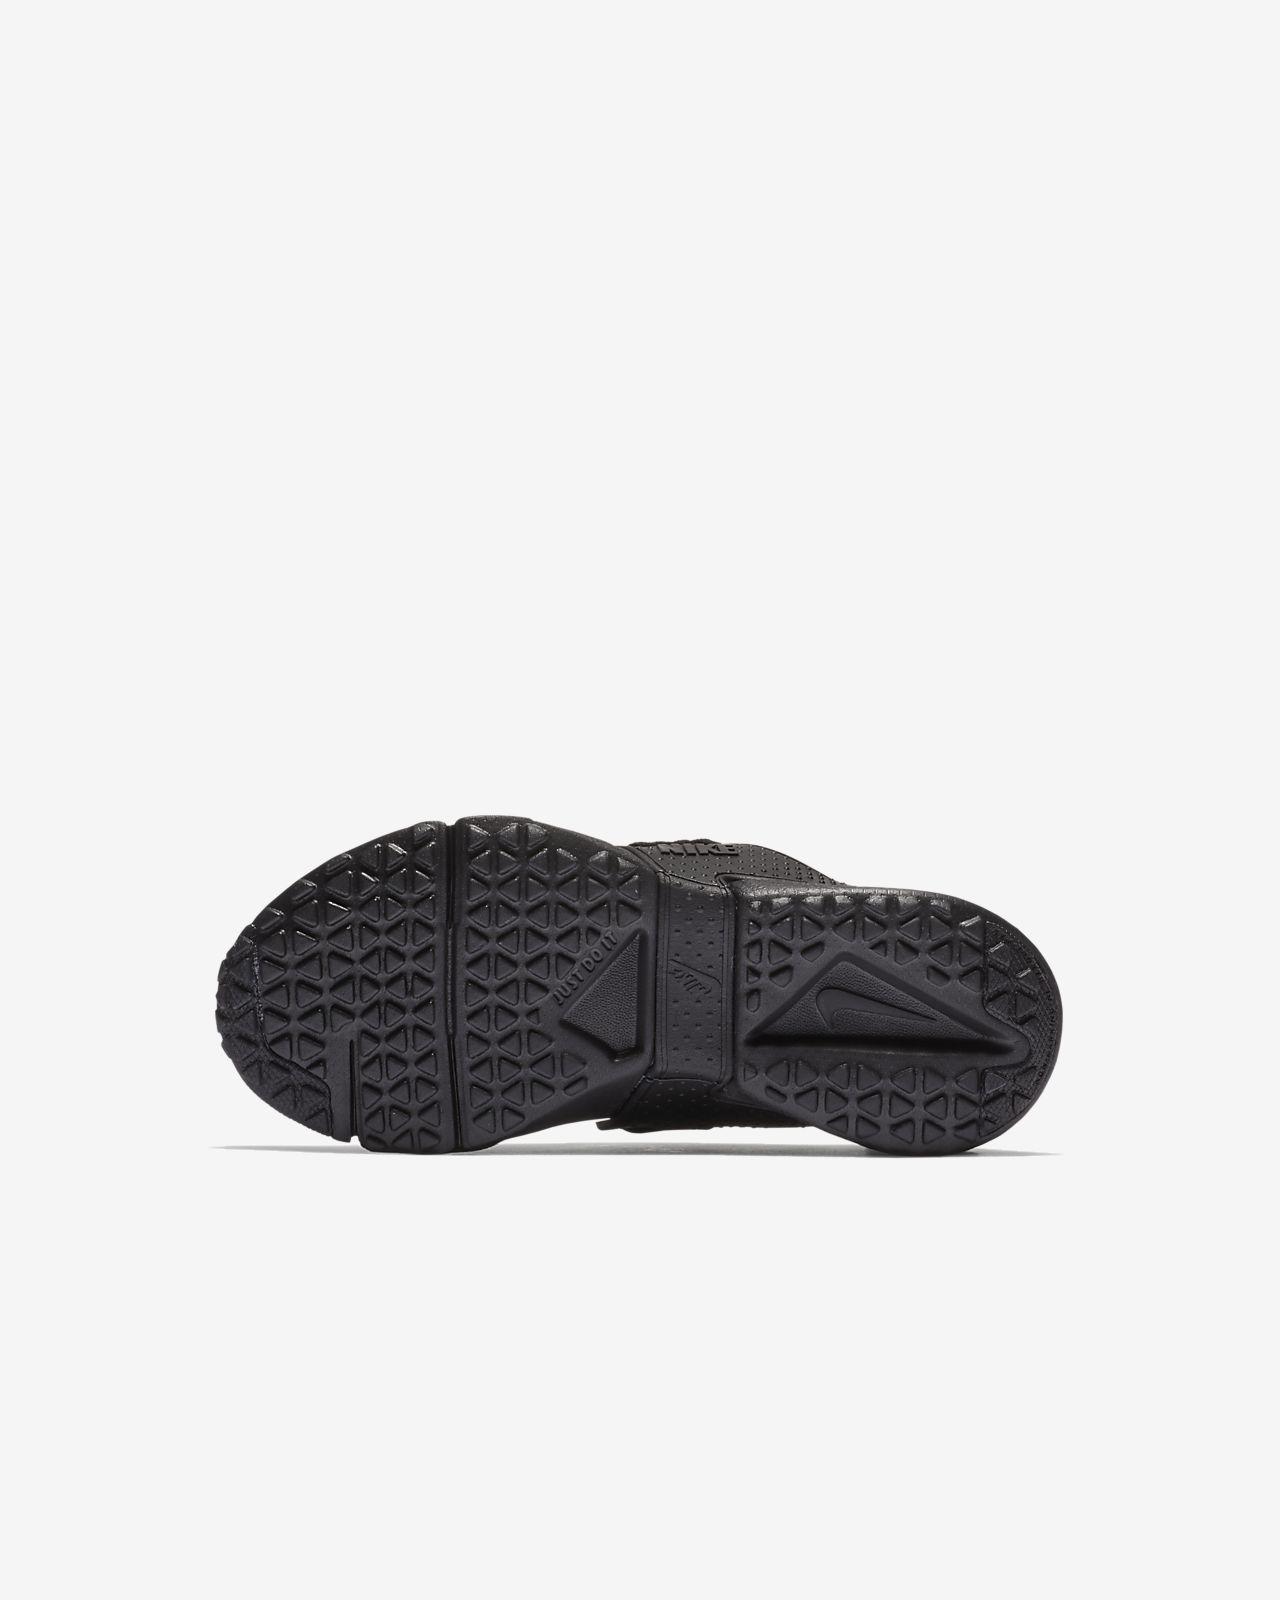 db9aee16d9 Nike Huarache Extreme Little Kids' Shoe. Nike.com